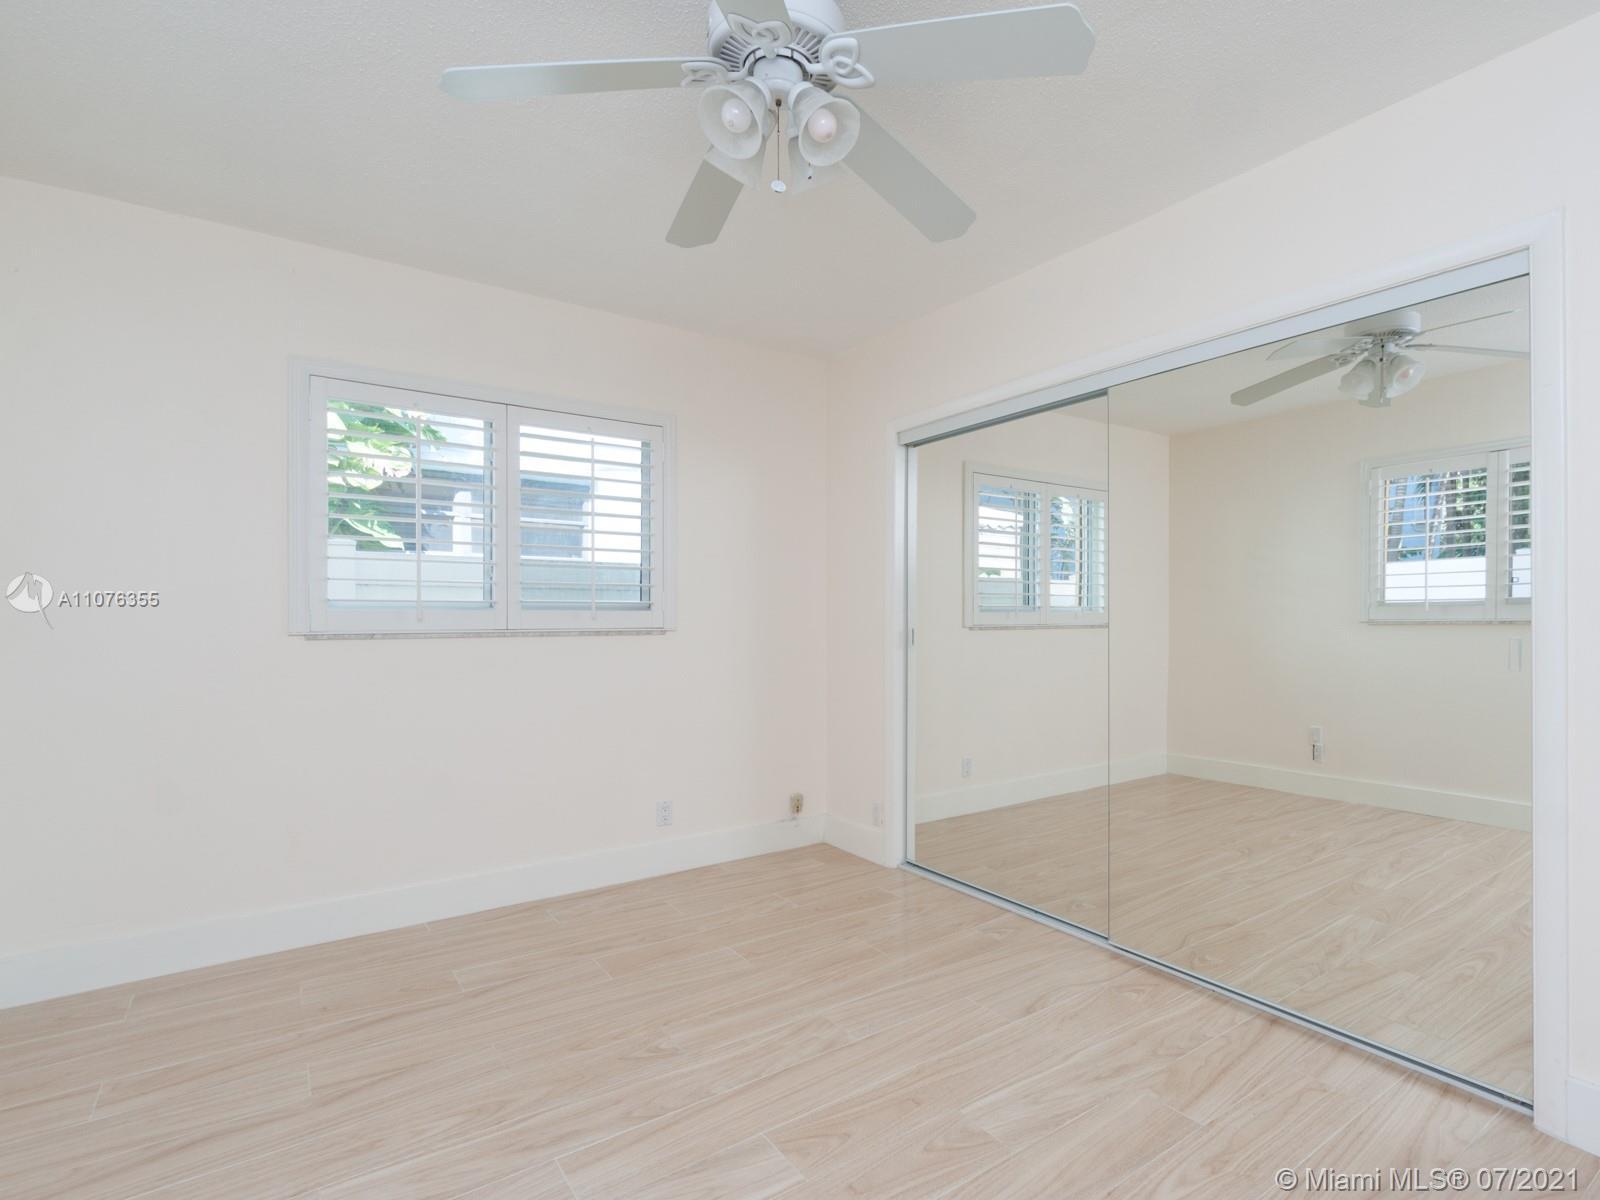 Photo of 338 Oak St, Home